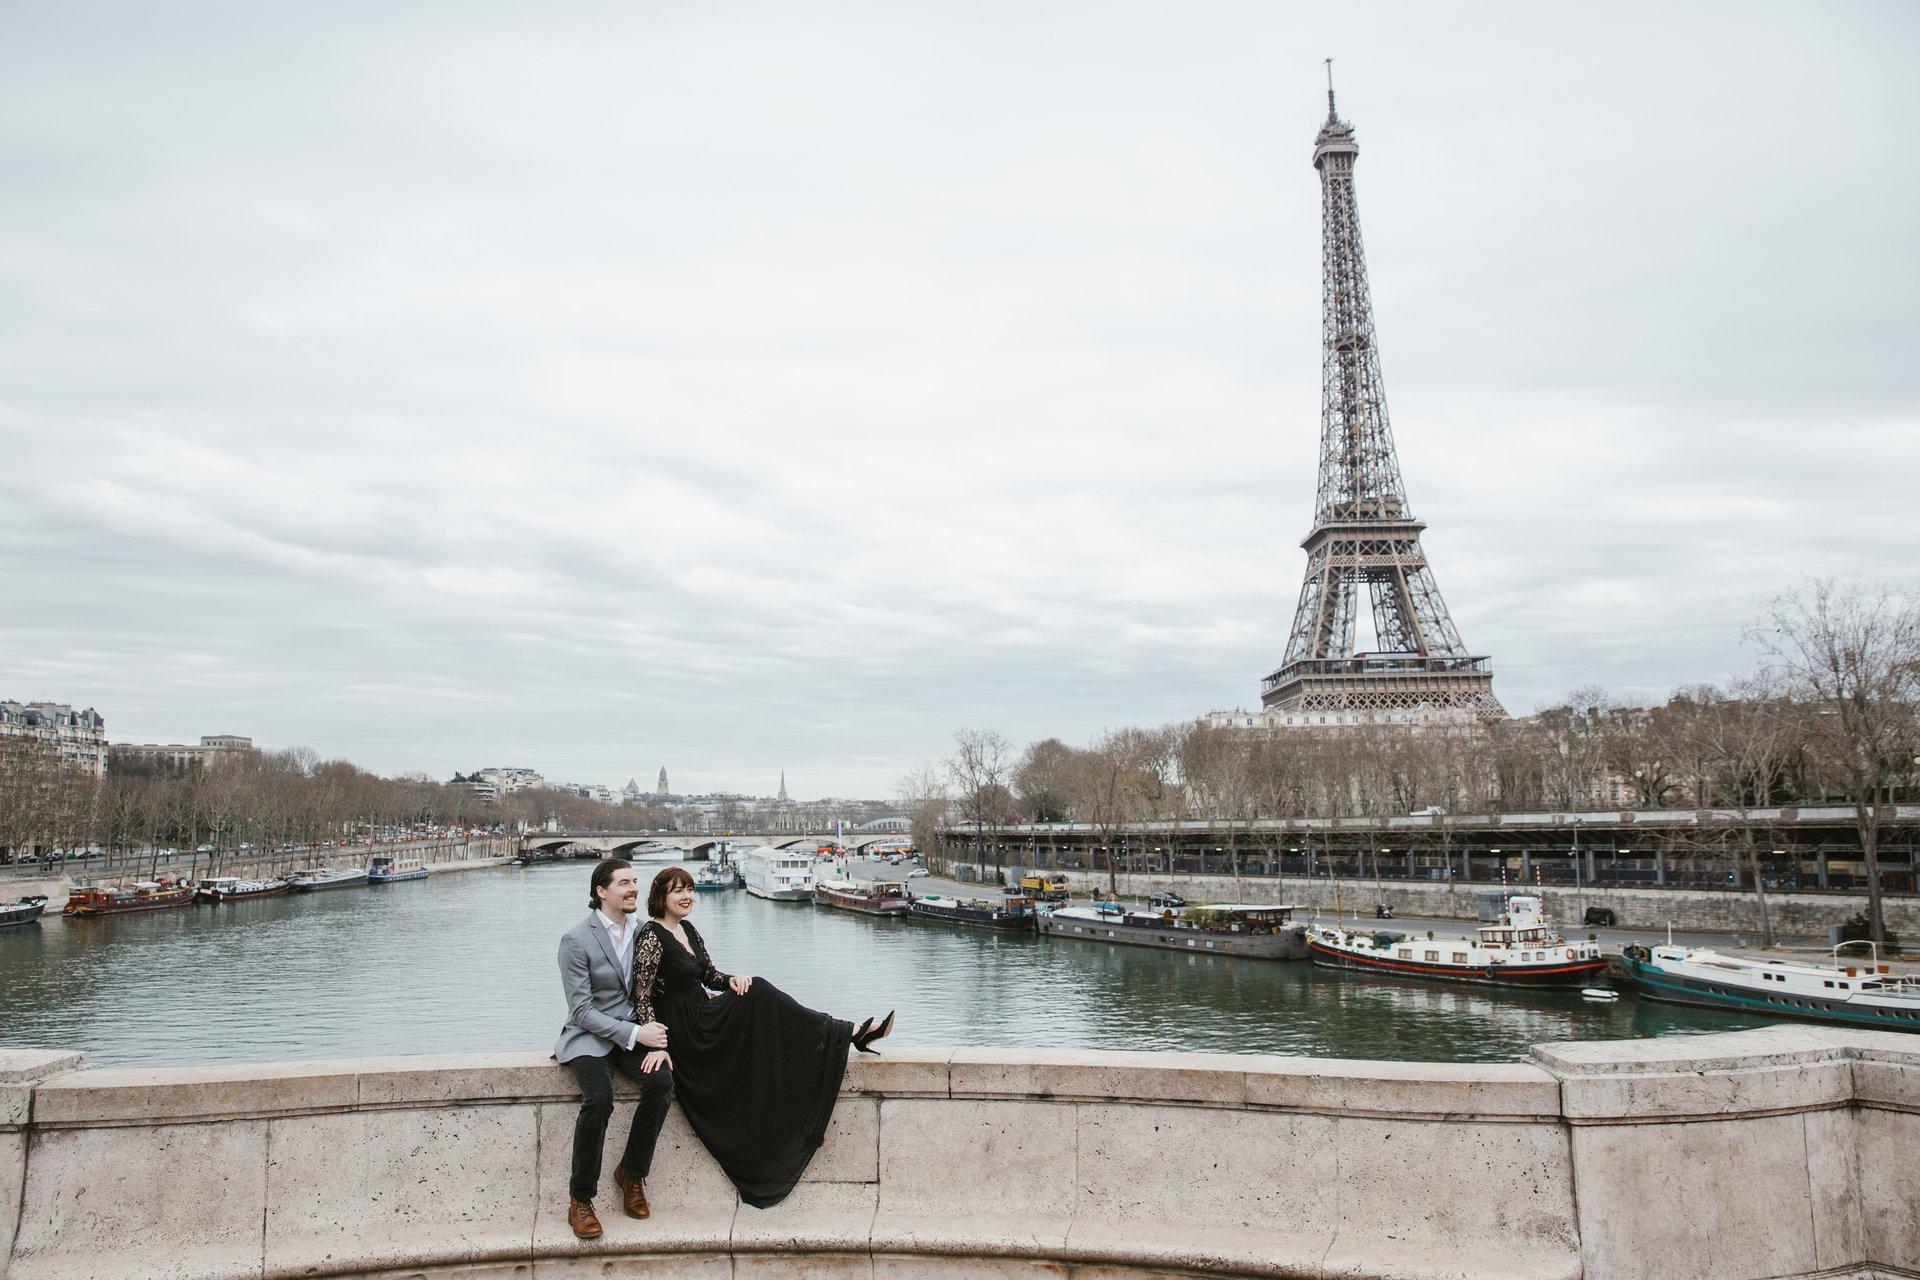 Flytographer Travel Story - Parisian Love Affair